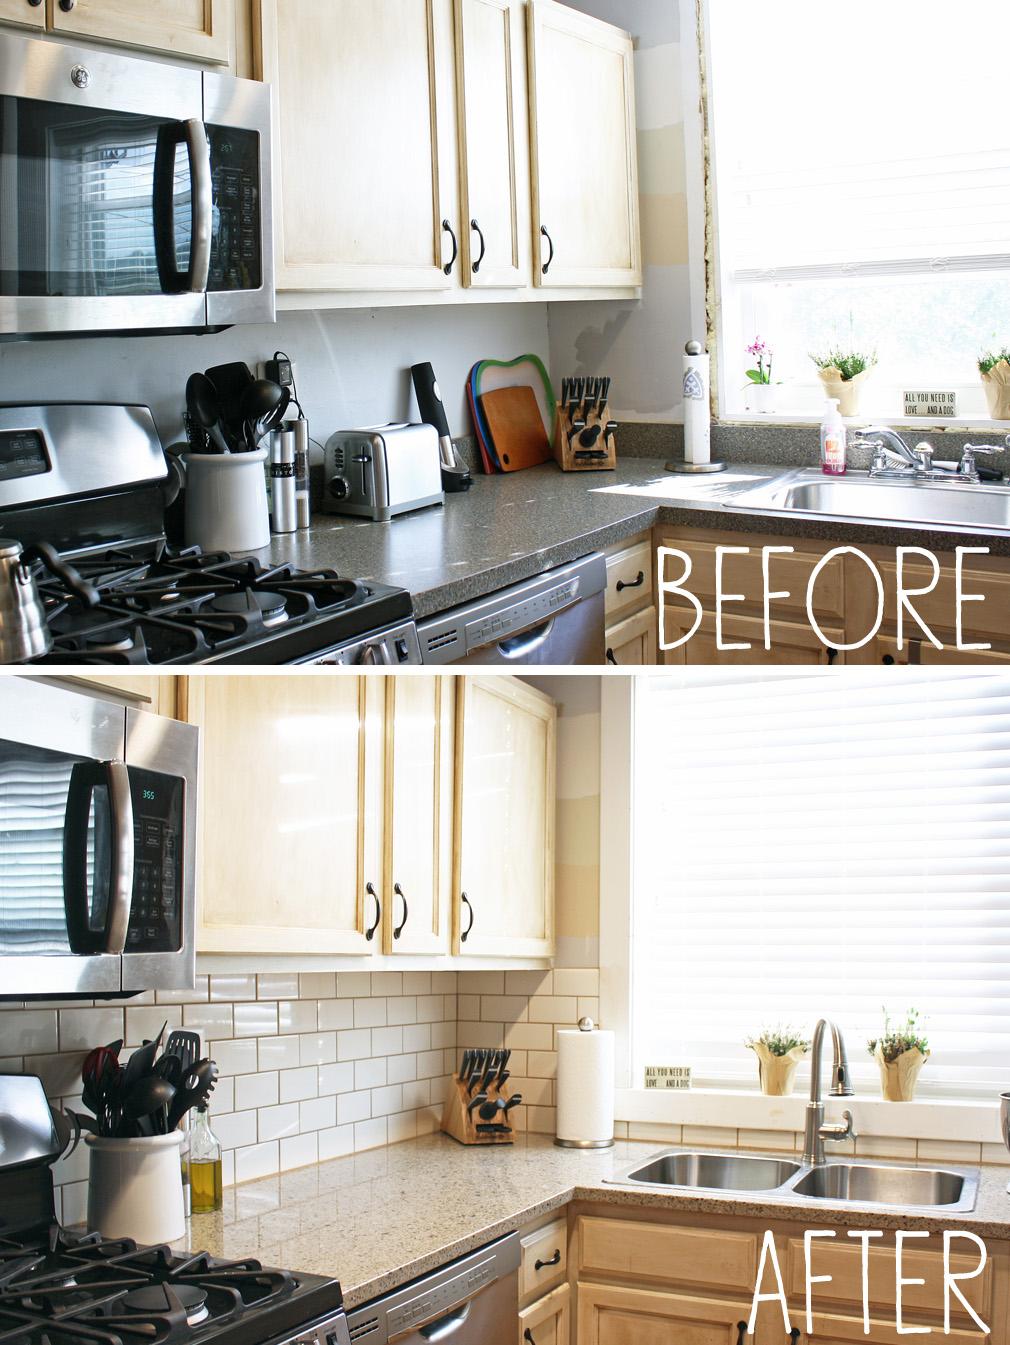 our new kitchen countertops and backsplash kitchen counters and backsplash Before and After Kitchen Backsplash 3